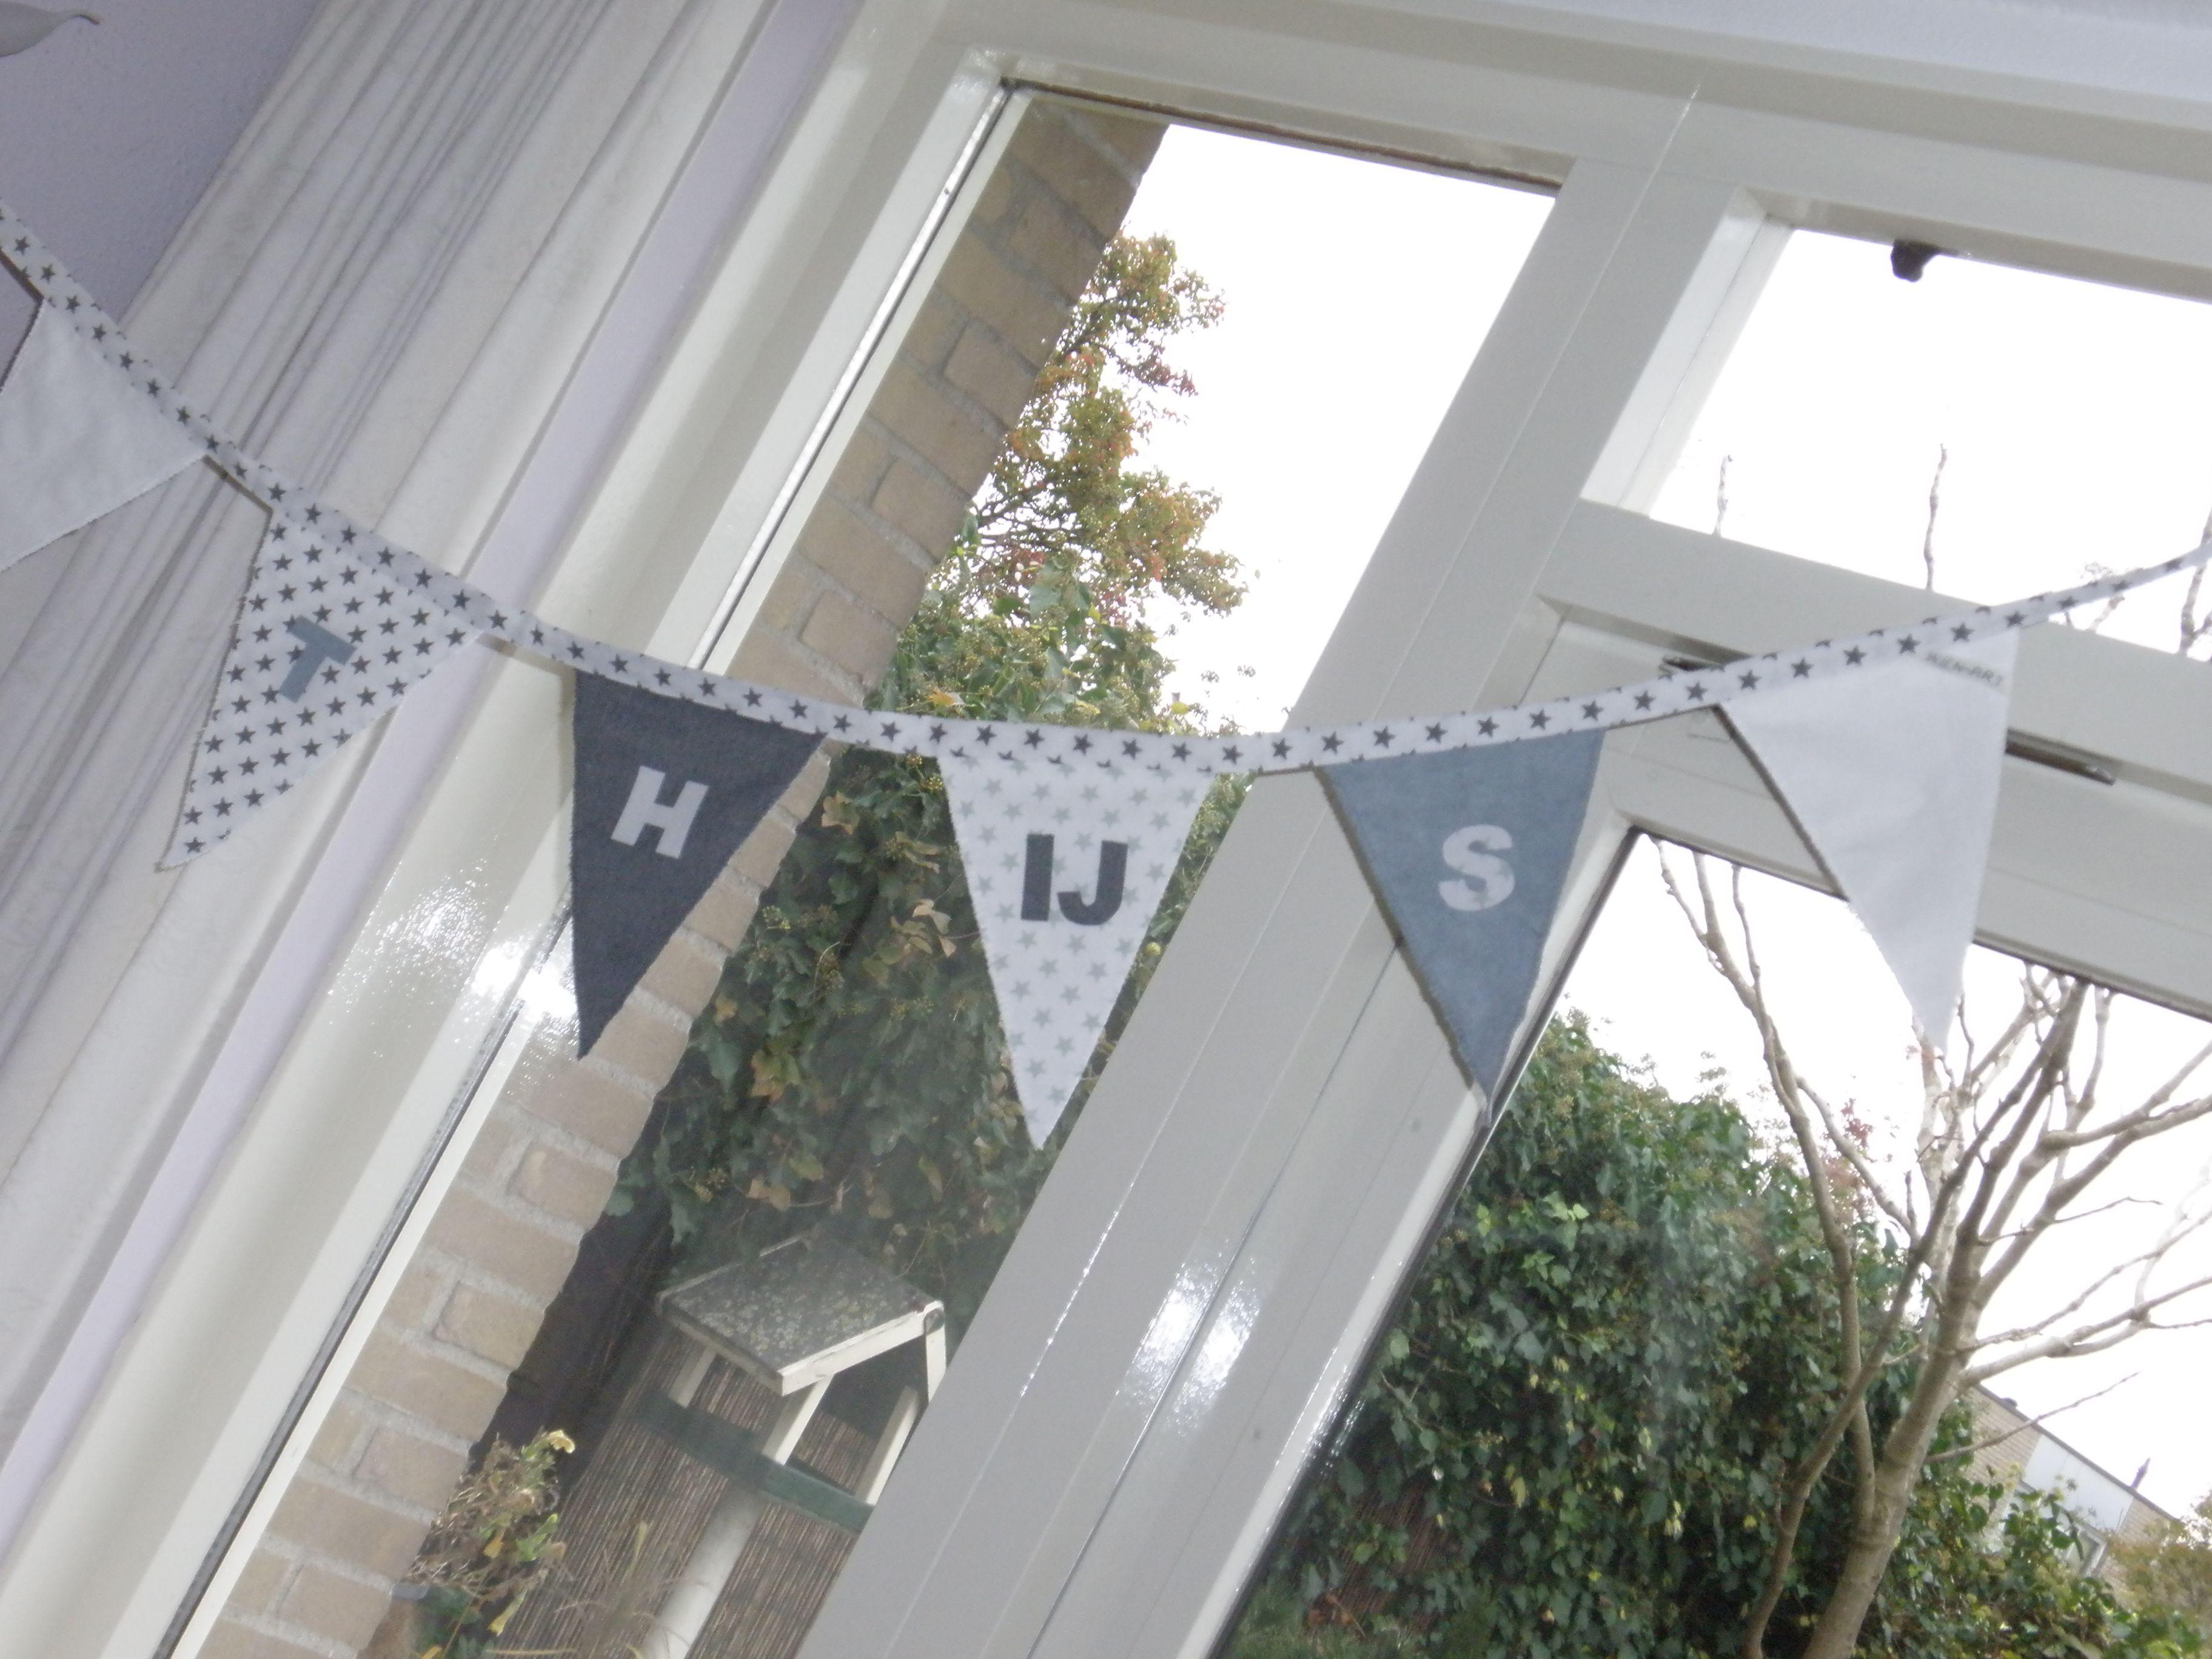 MADE BY WIEN-ART Vlaggenlijn http://wien-artfabrics.blogspot.nl/2015/11/babykamer-accessoires.html